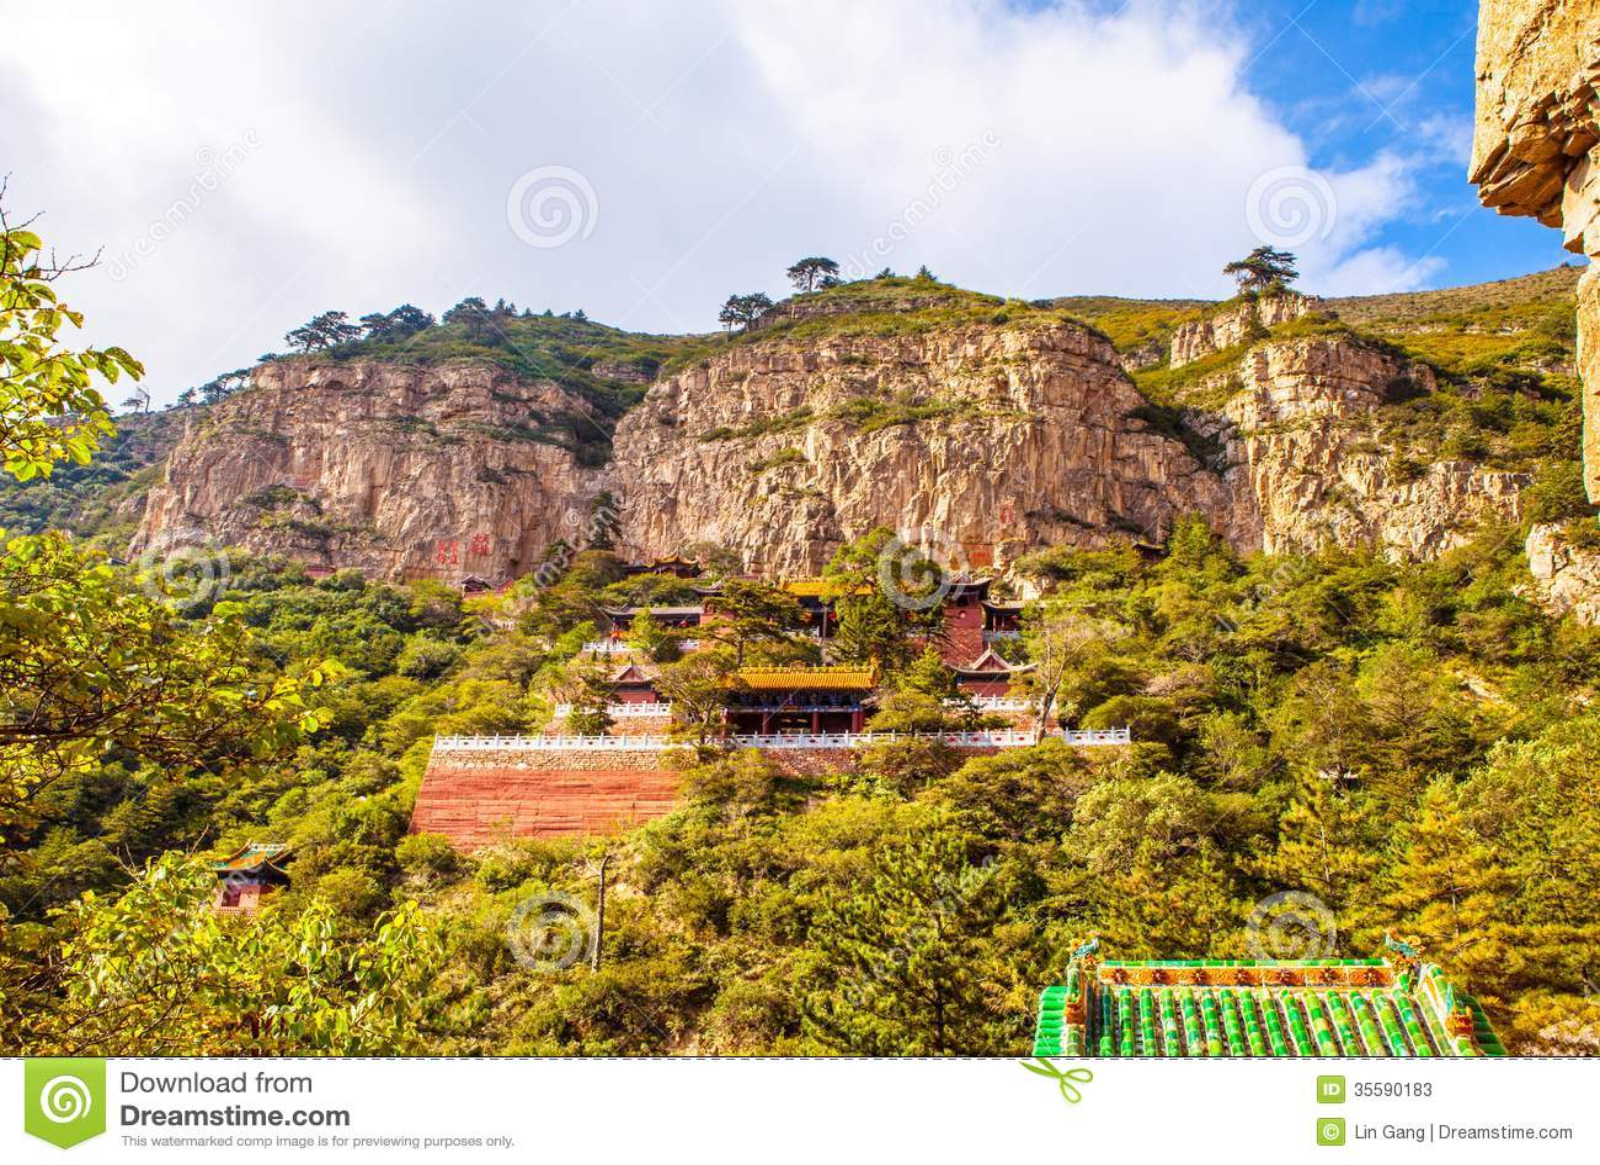 Mountain Hengshan(Northern Great Mountain) scene.